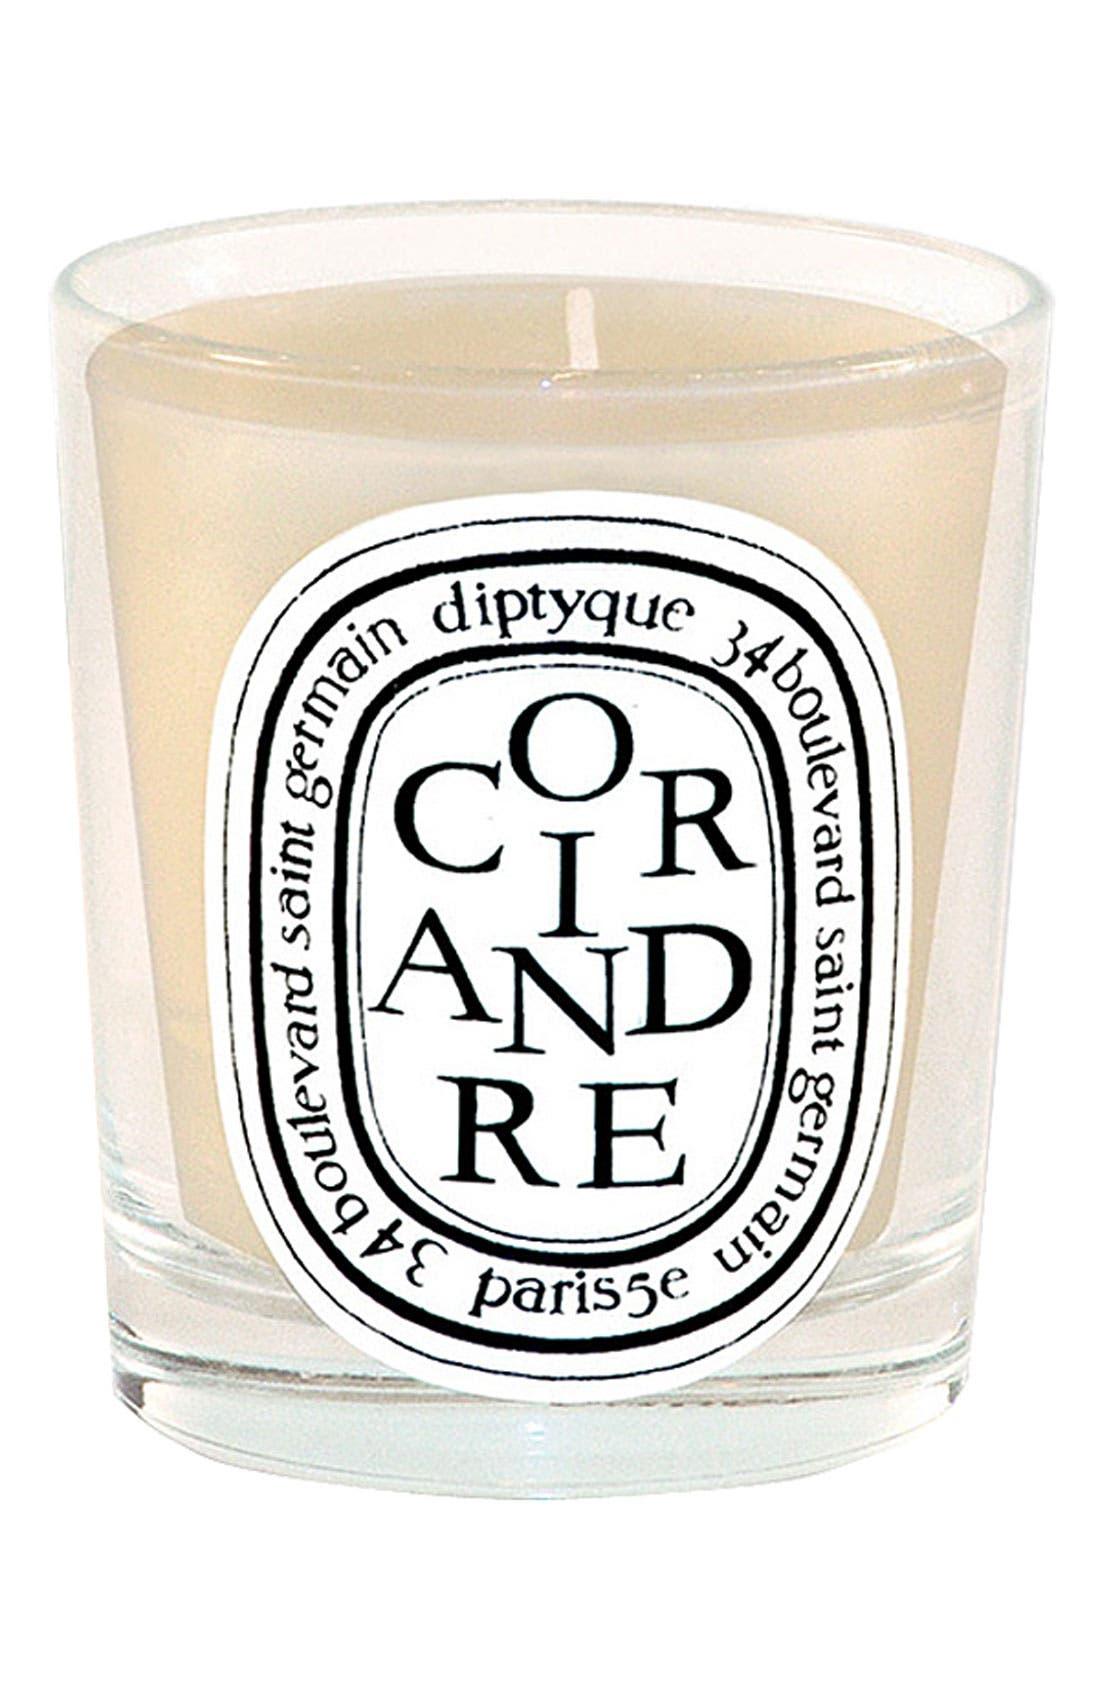 Coriandre/Coriander Scented Candle,                             Main thumbnail 1, color,                             NO COLOR